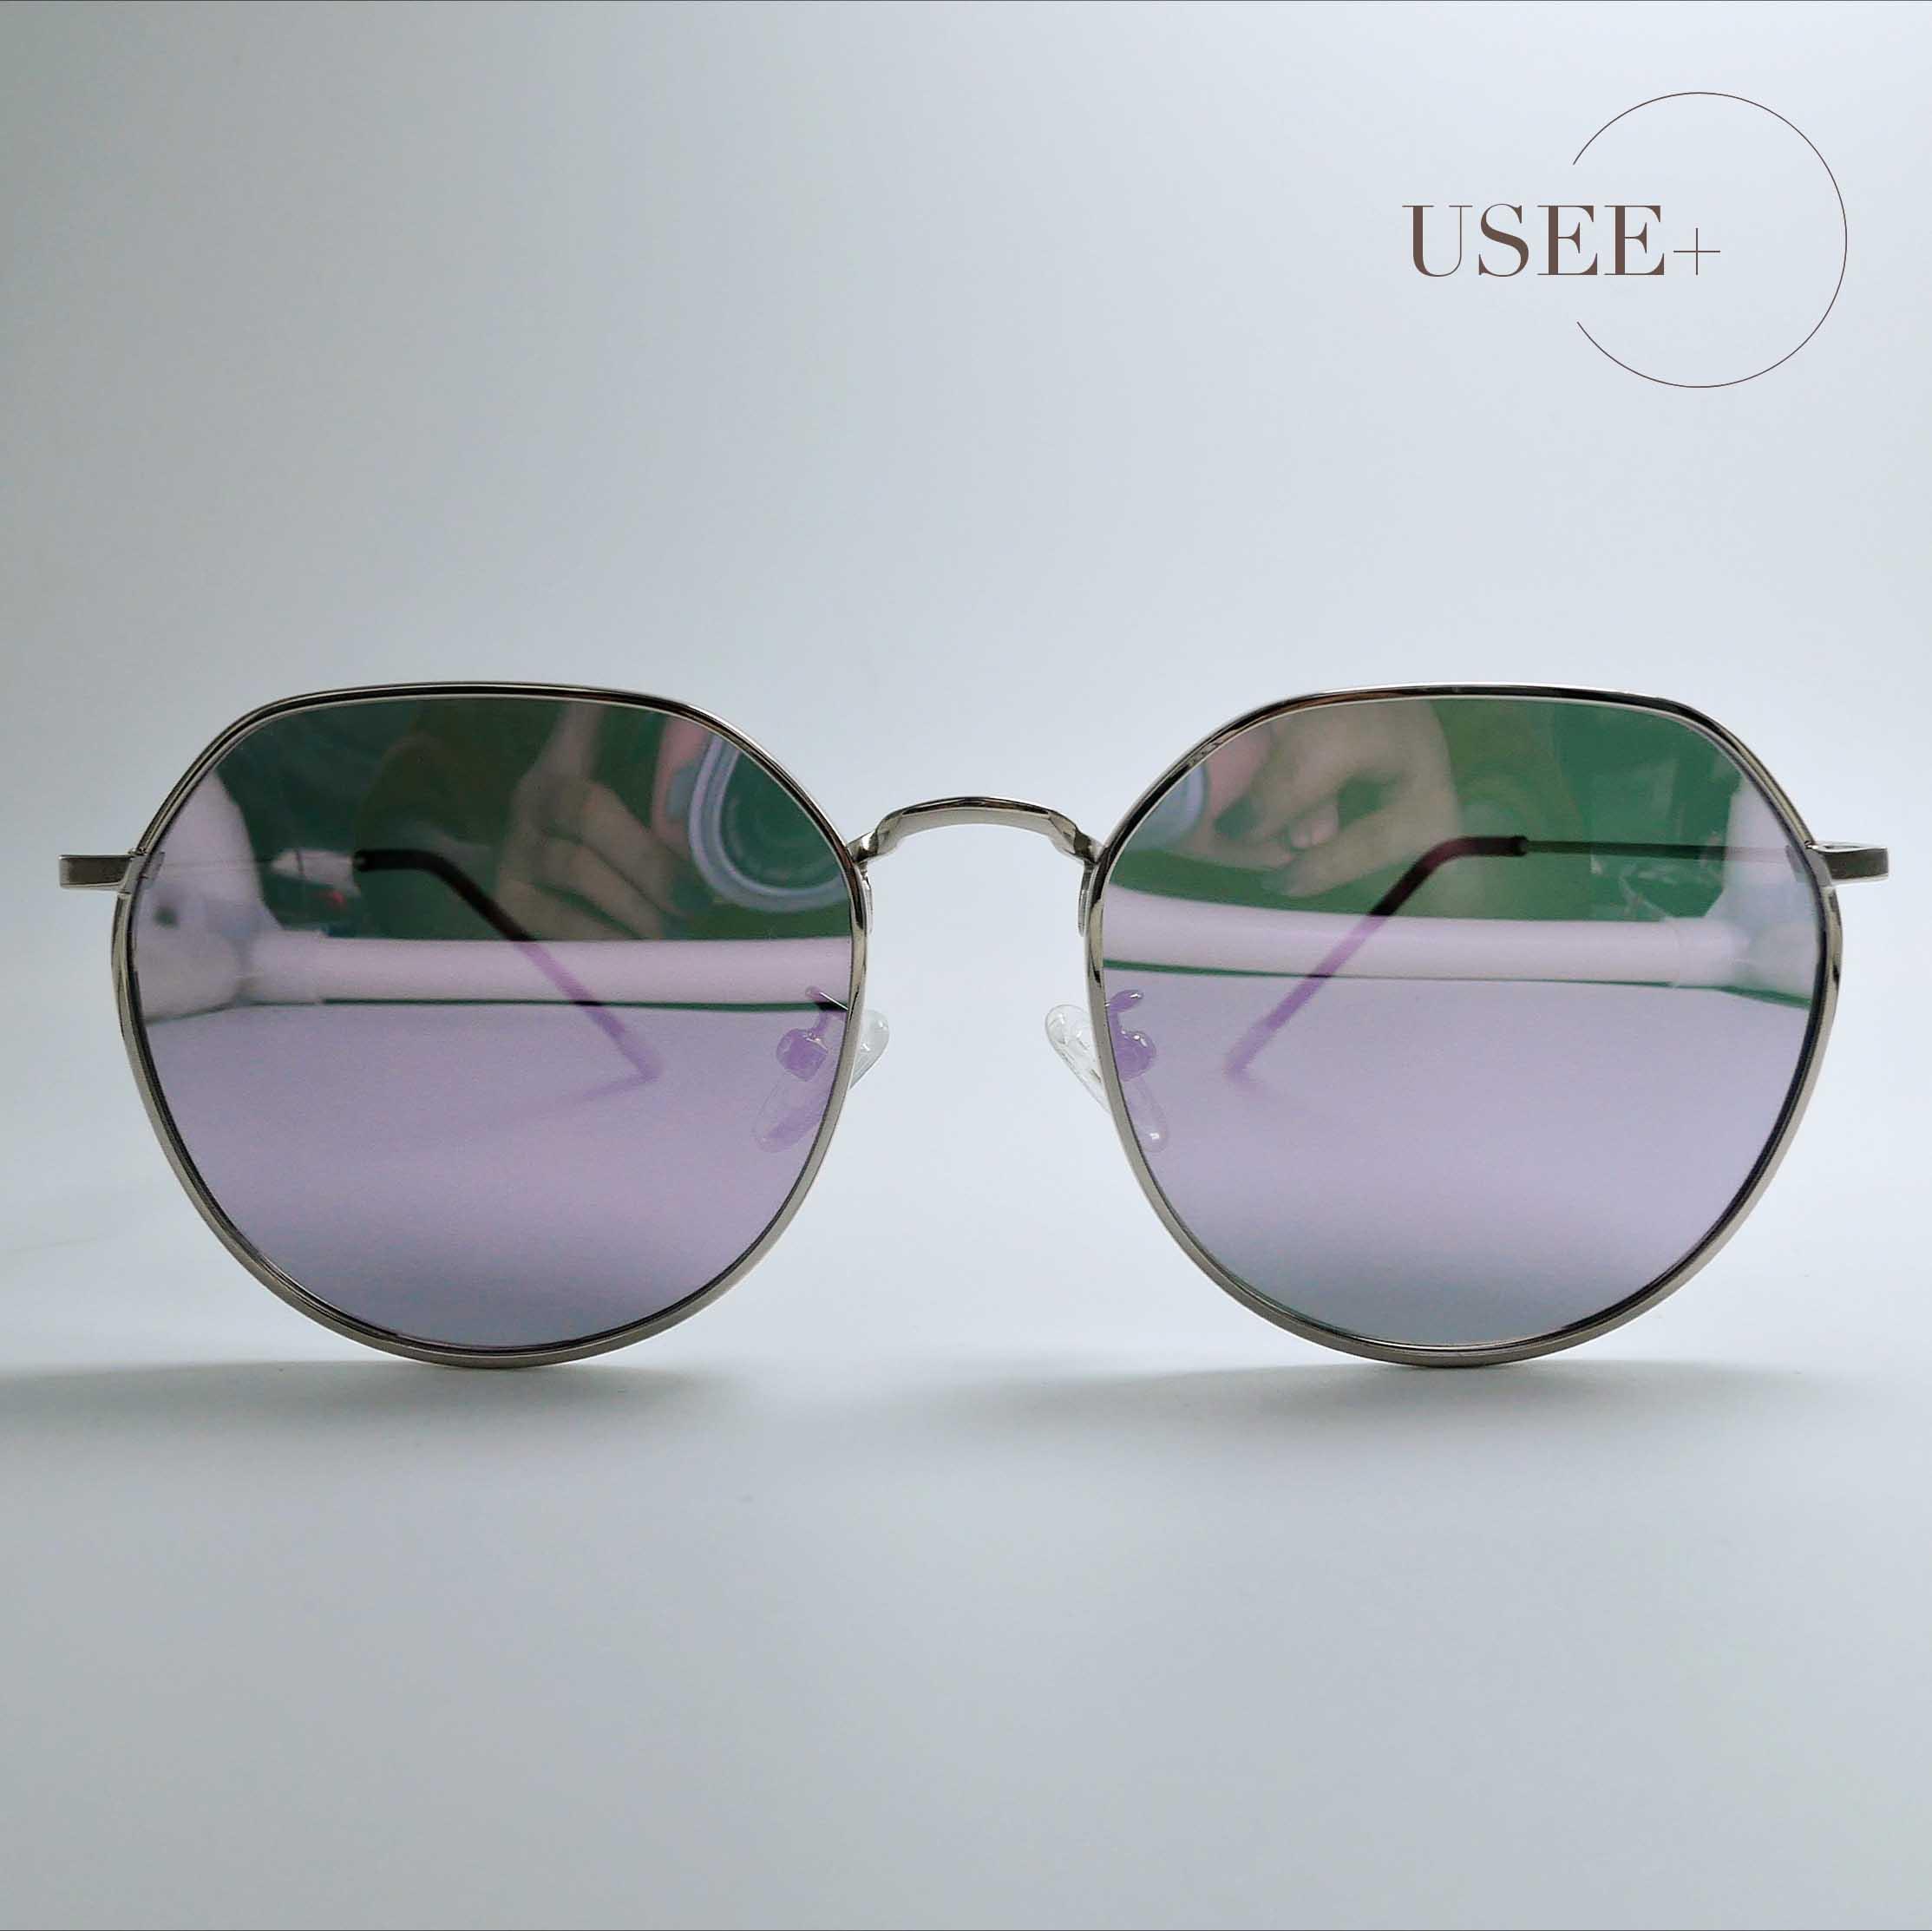 USEE+ 有晰眼镜艺术款高级感百搭墨镜